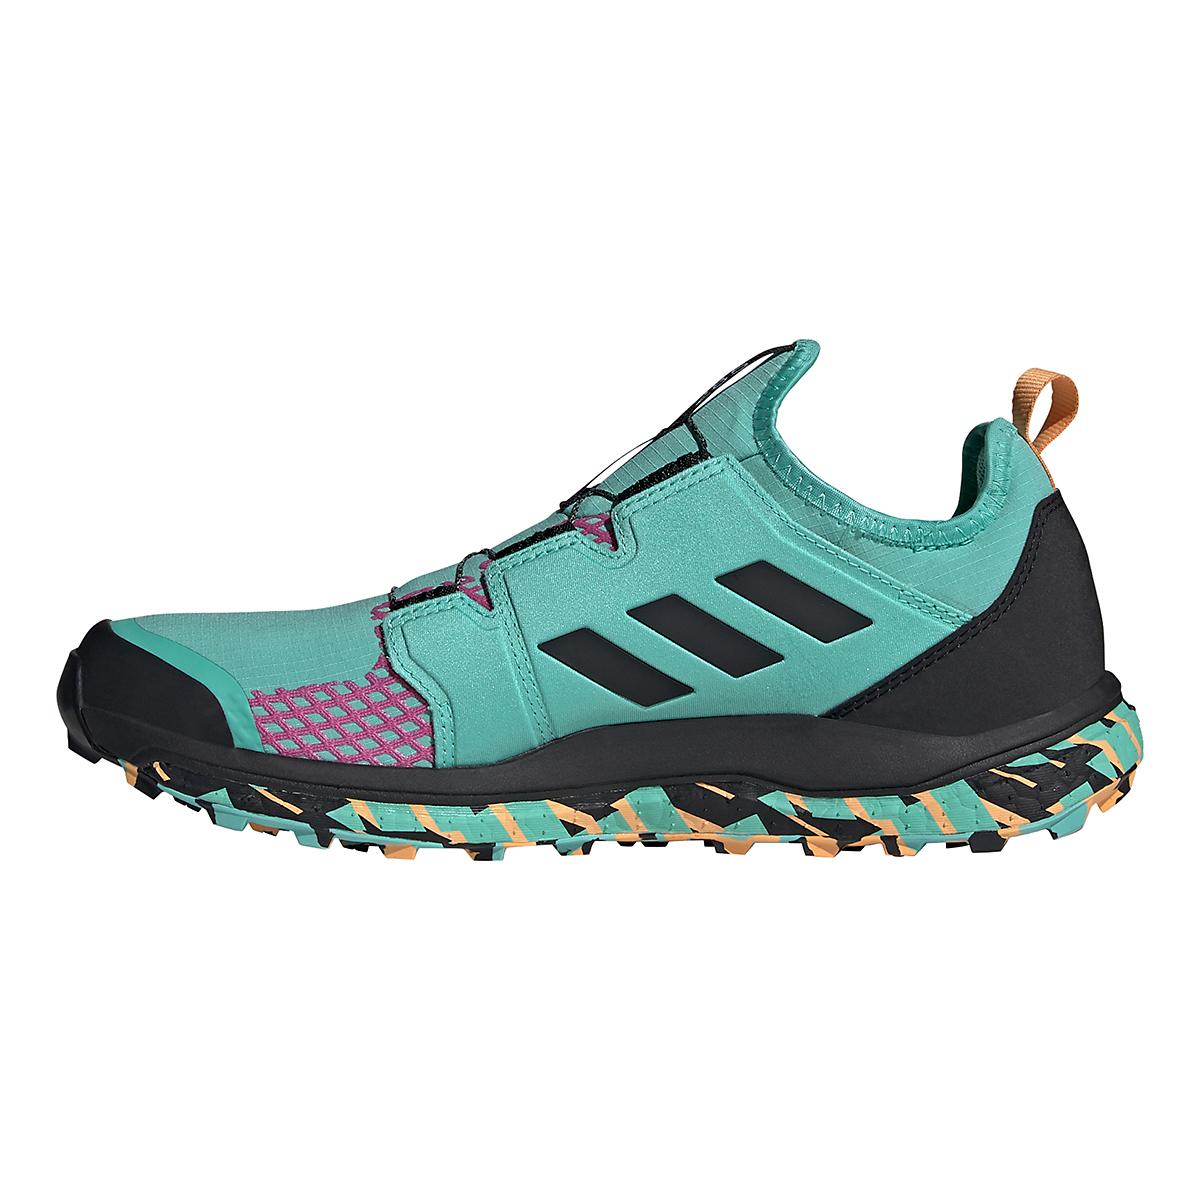 Men's Adidas Terrex Agravic BOA Trail Running Shoe - Color: Acid Mint/Core Black/Screaming Pink - Size: 6 - Width: Regular, Acid Mint/Core Black/Screaming Pink, large, image 2